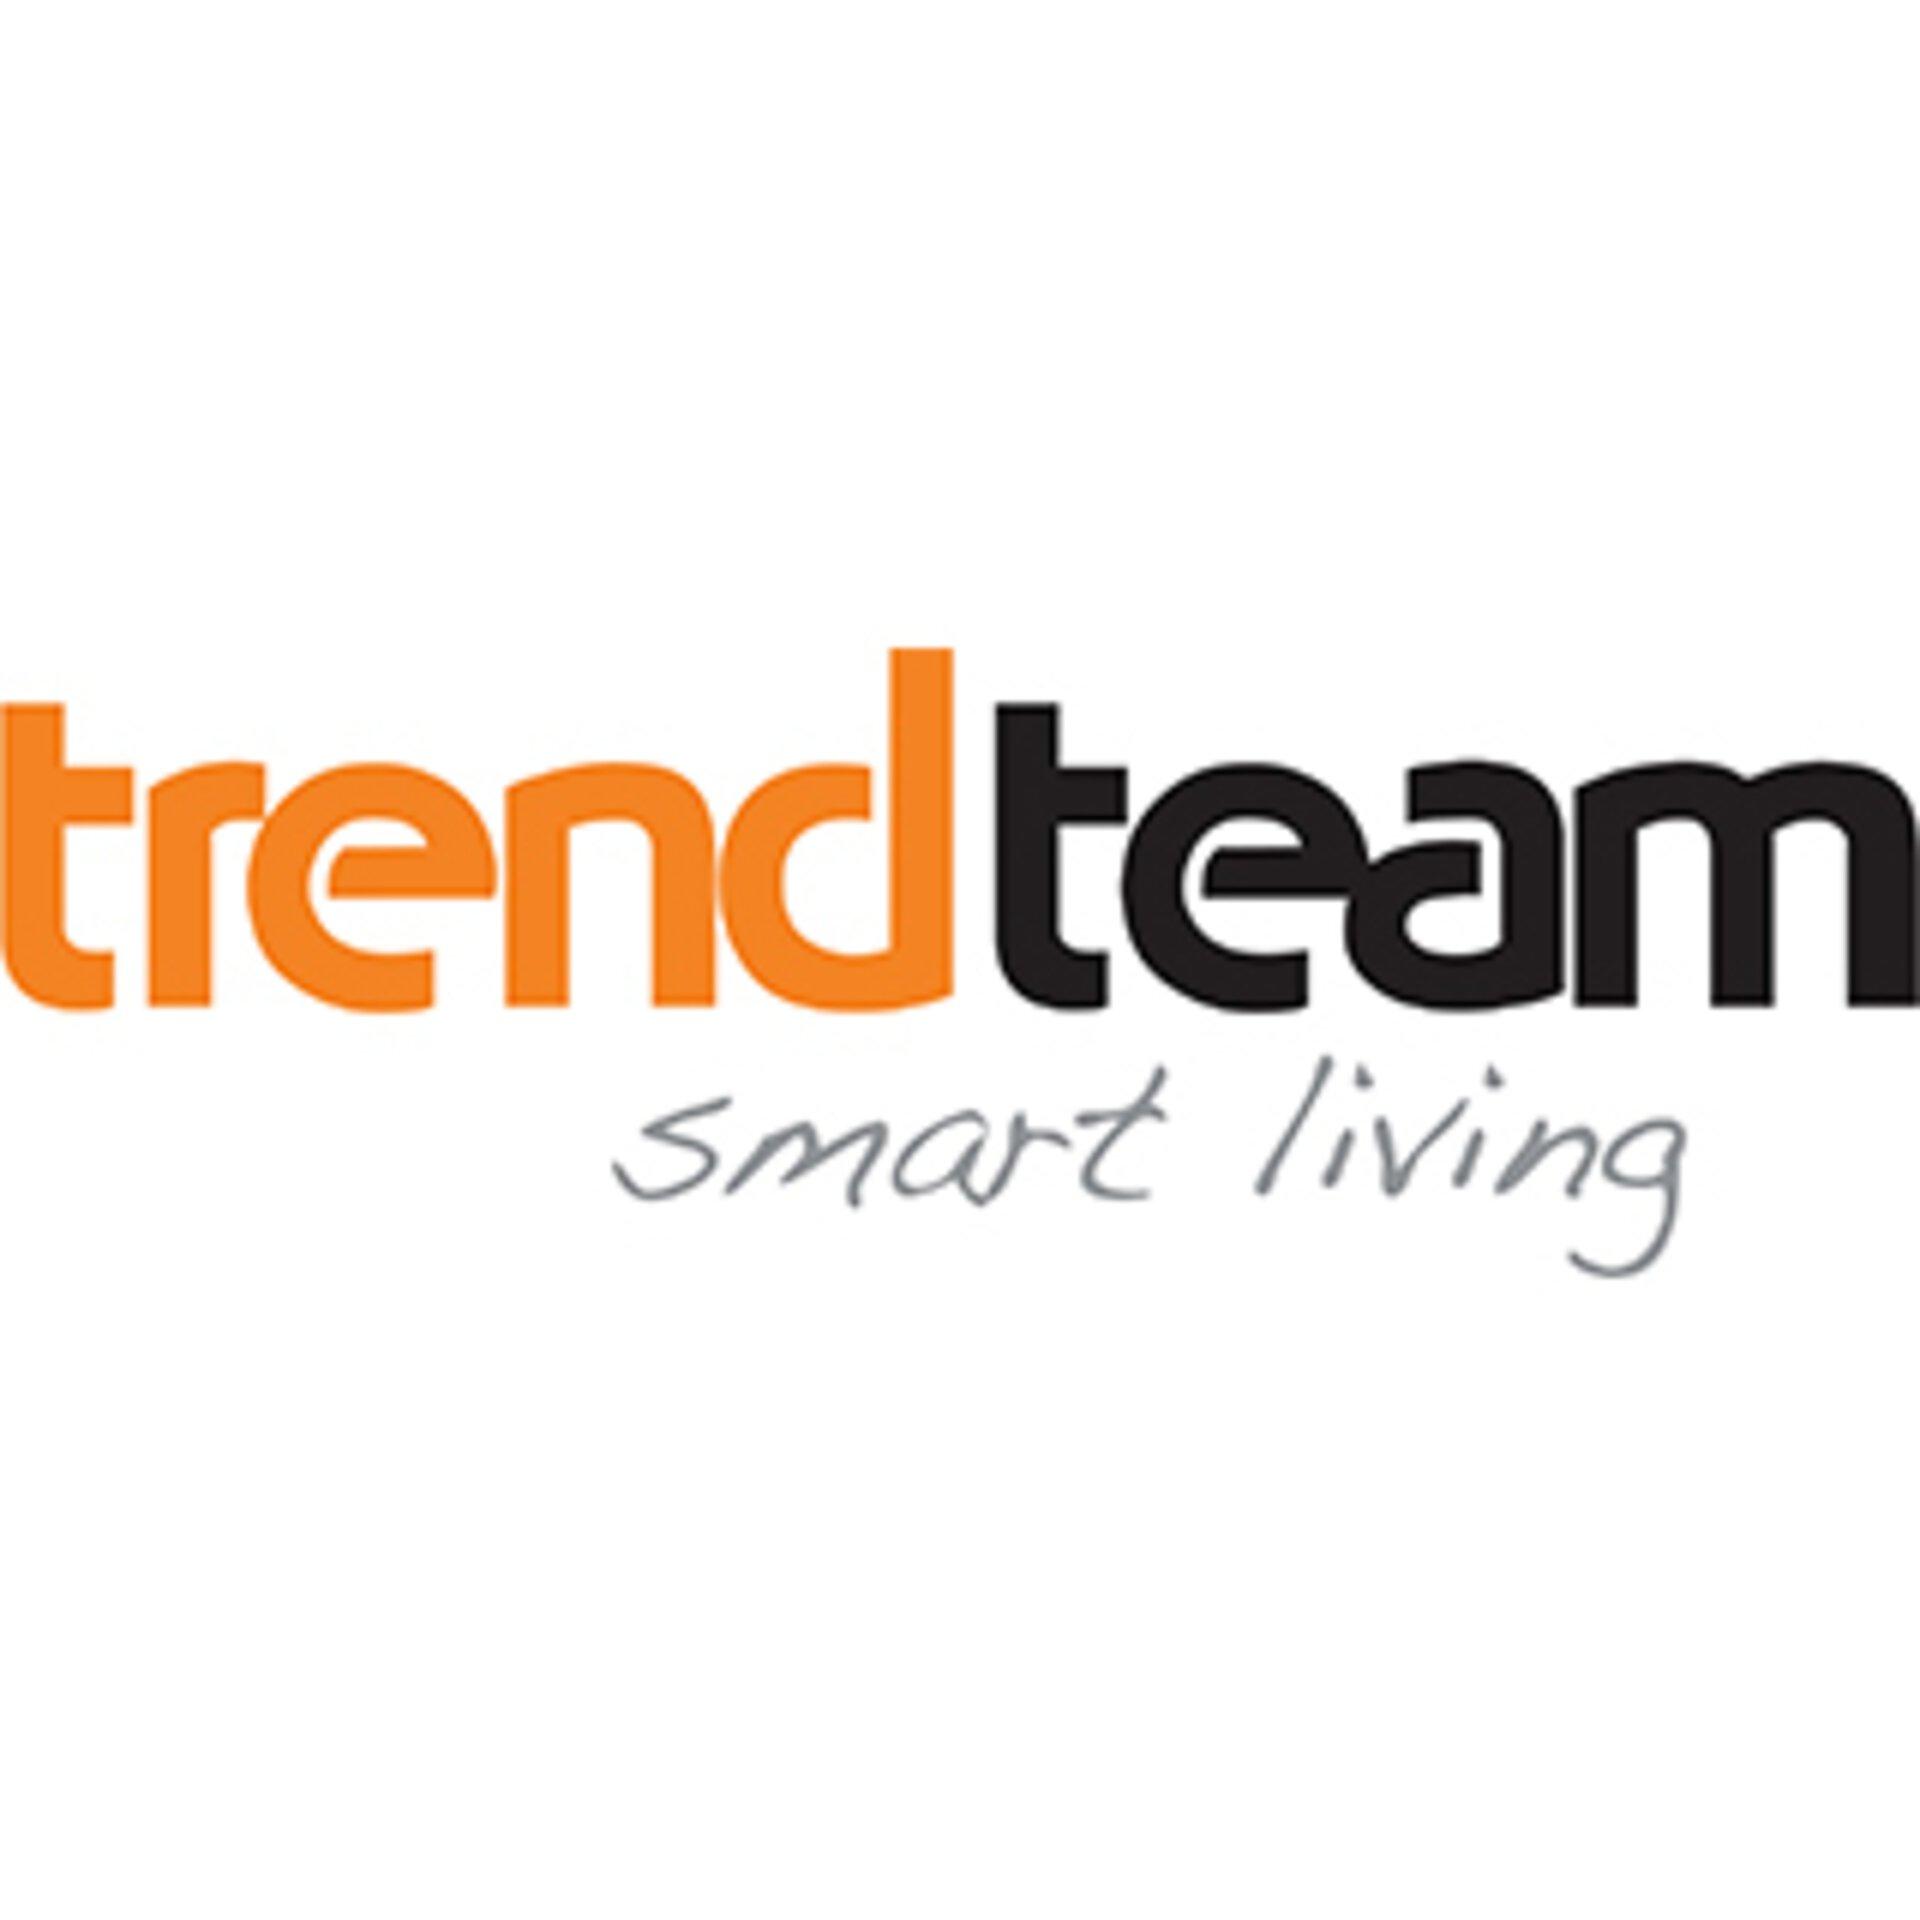 Trendteam